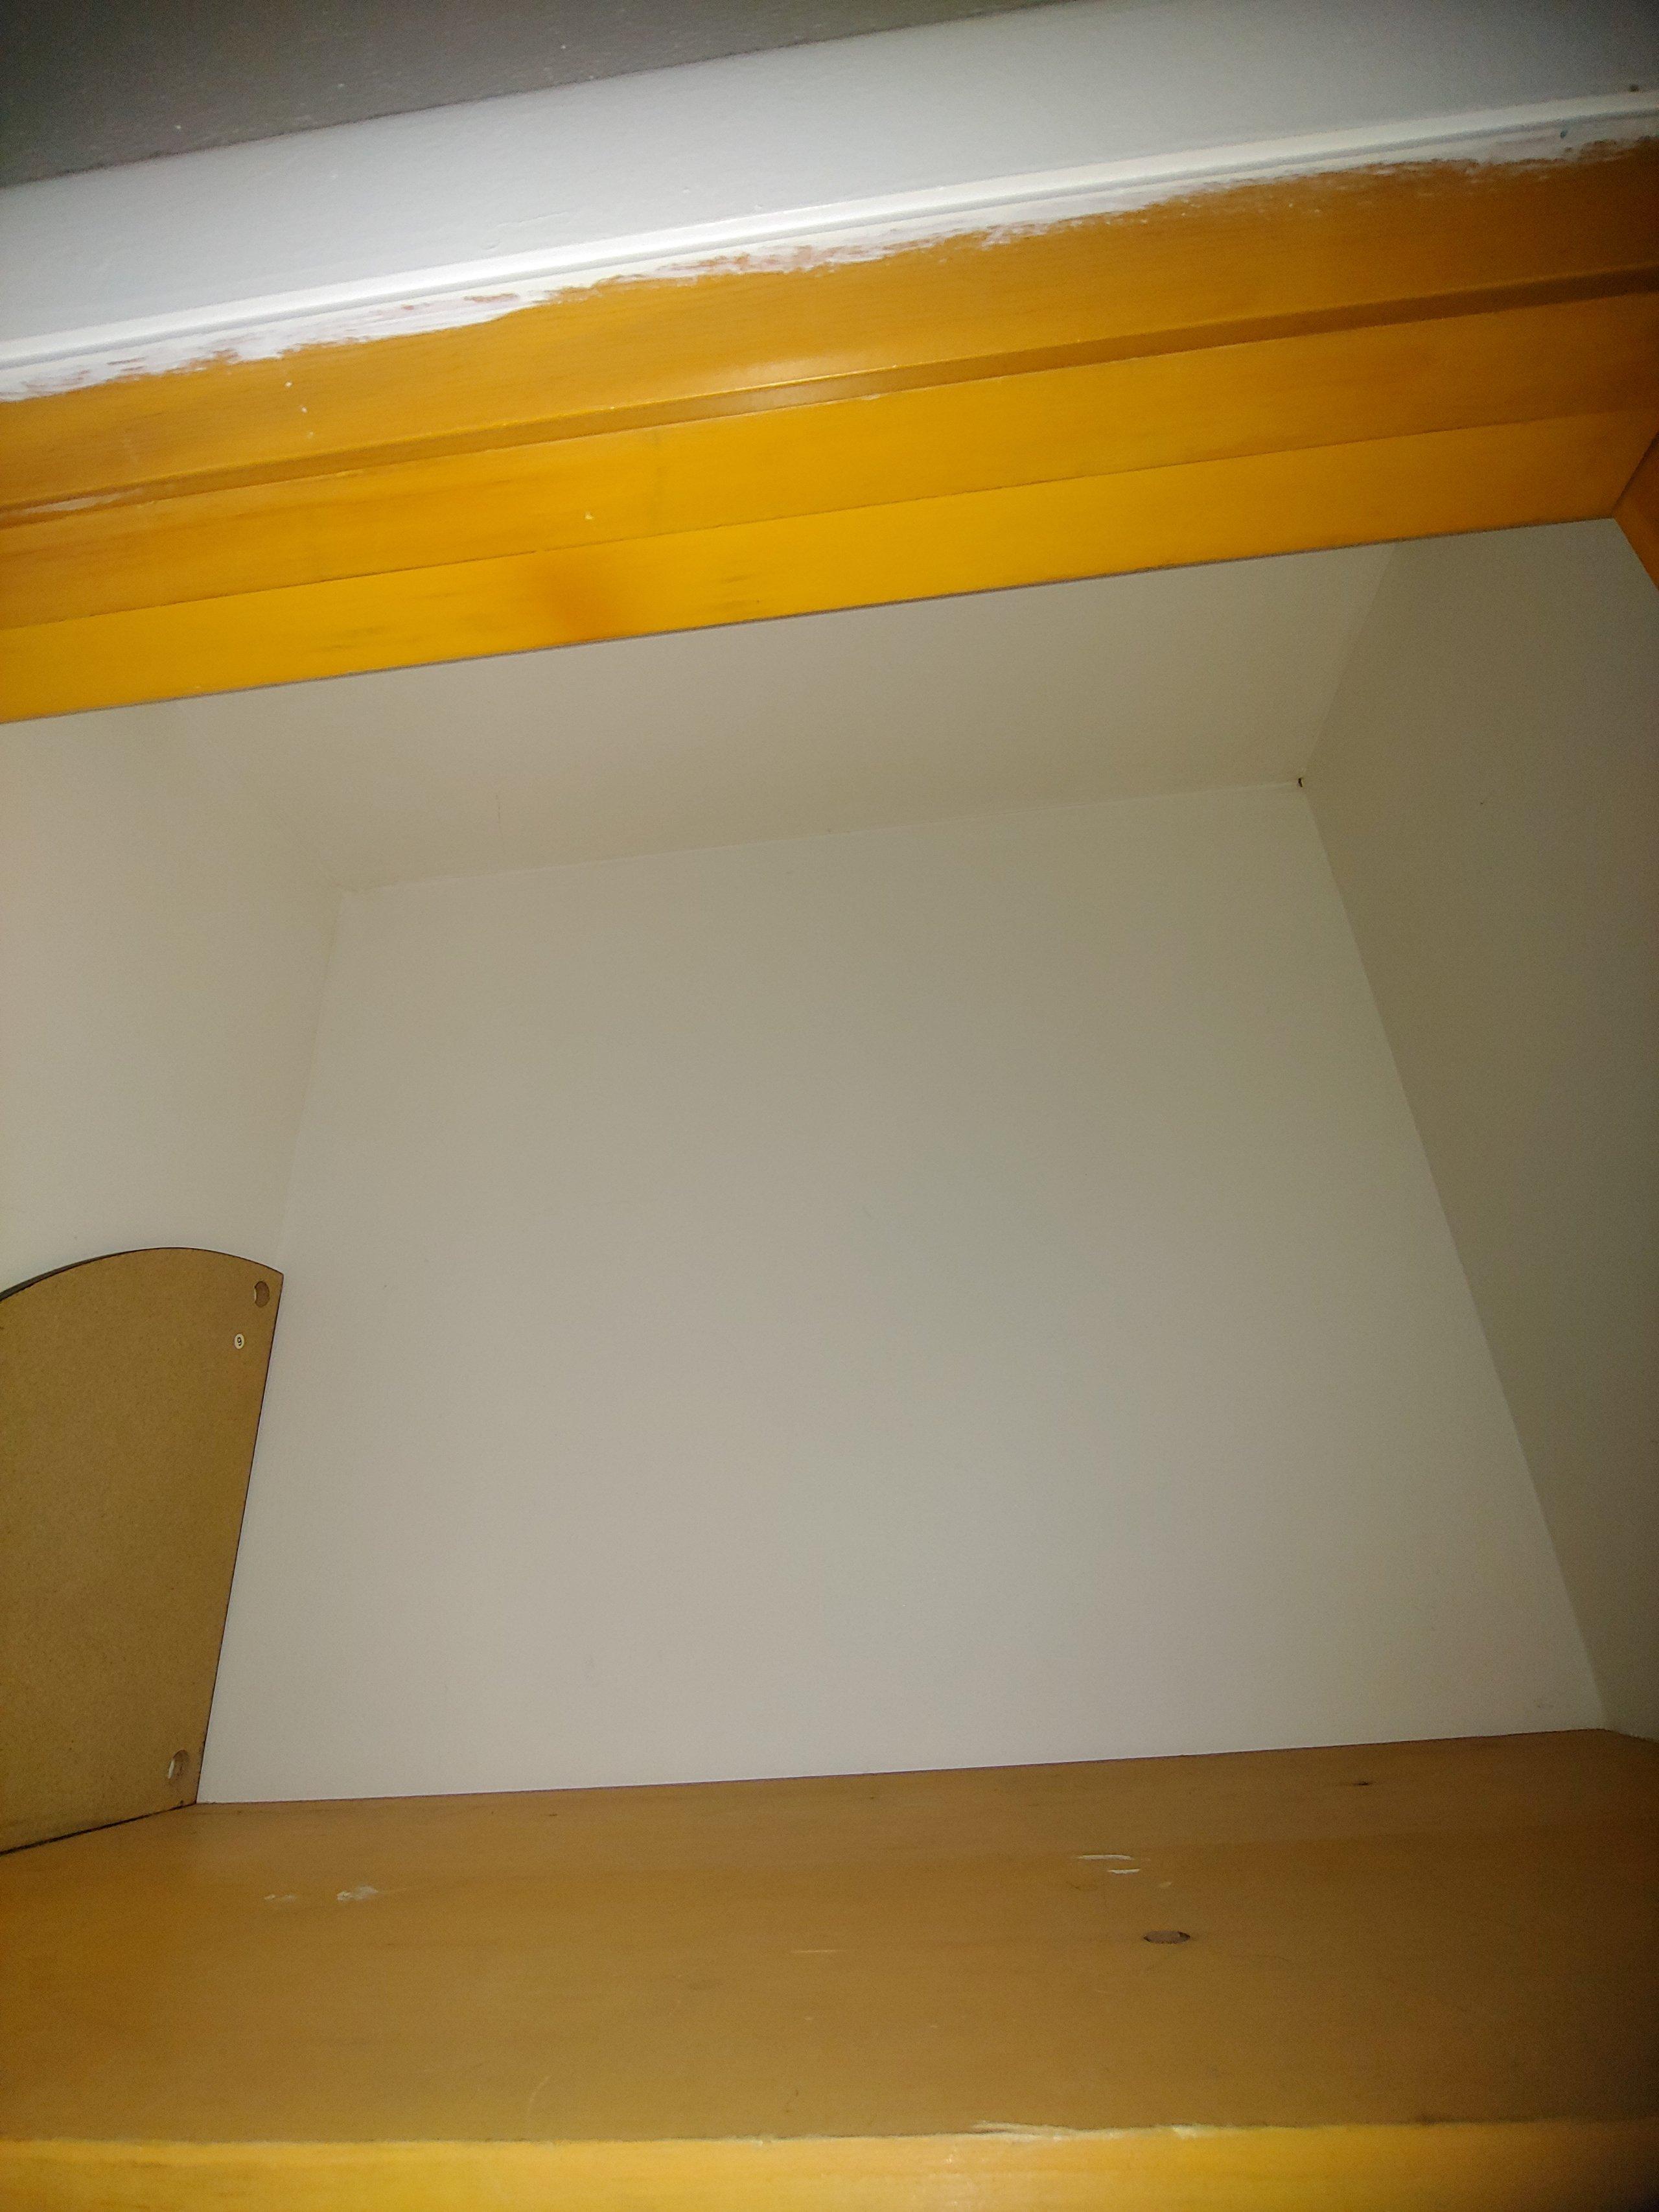 8x3 Closet self storage unit